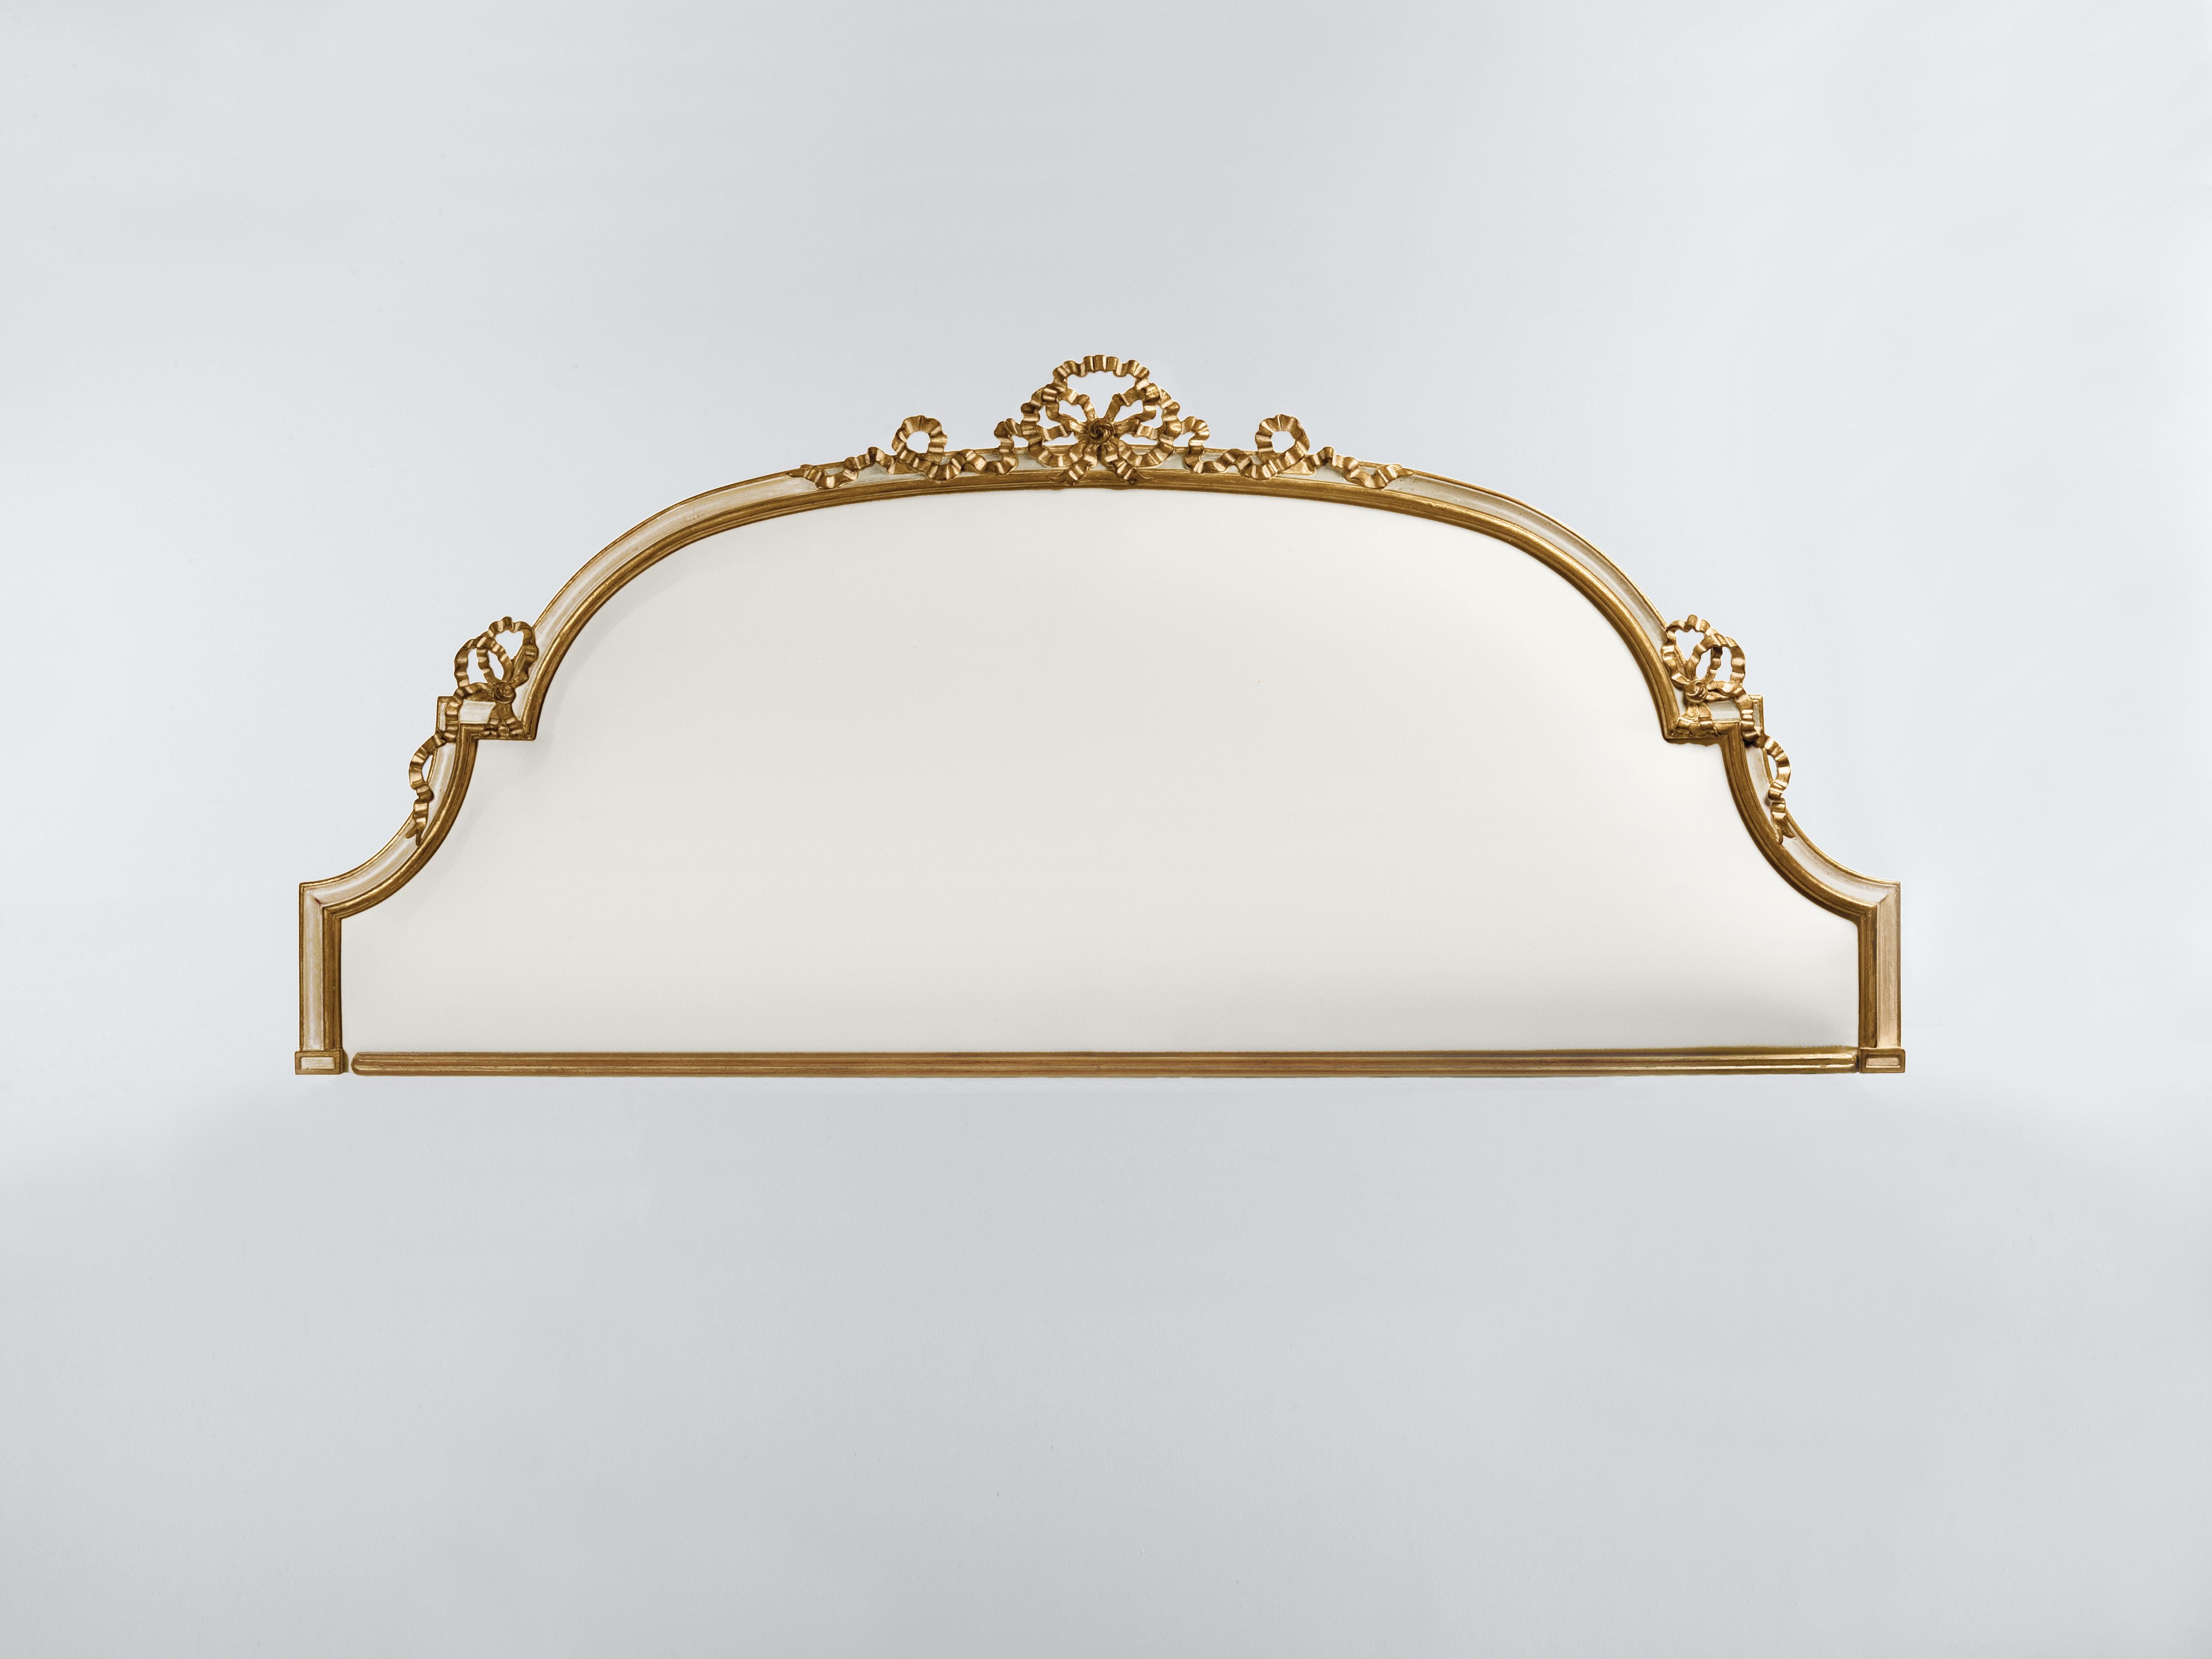 Decorative Crafts Beds